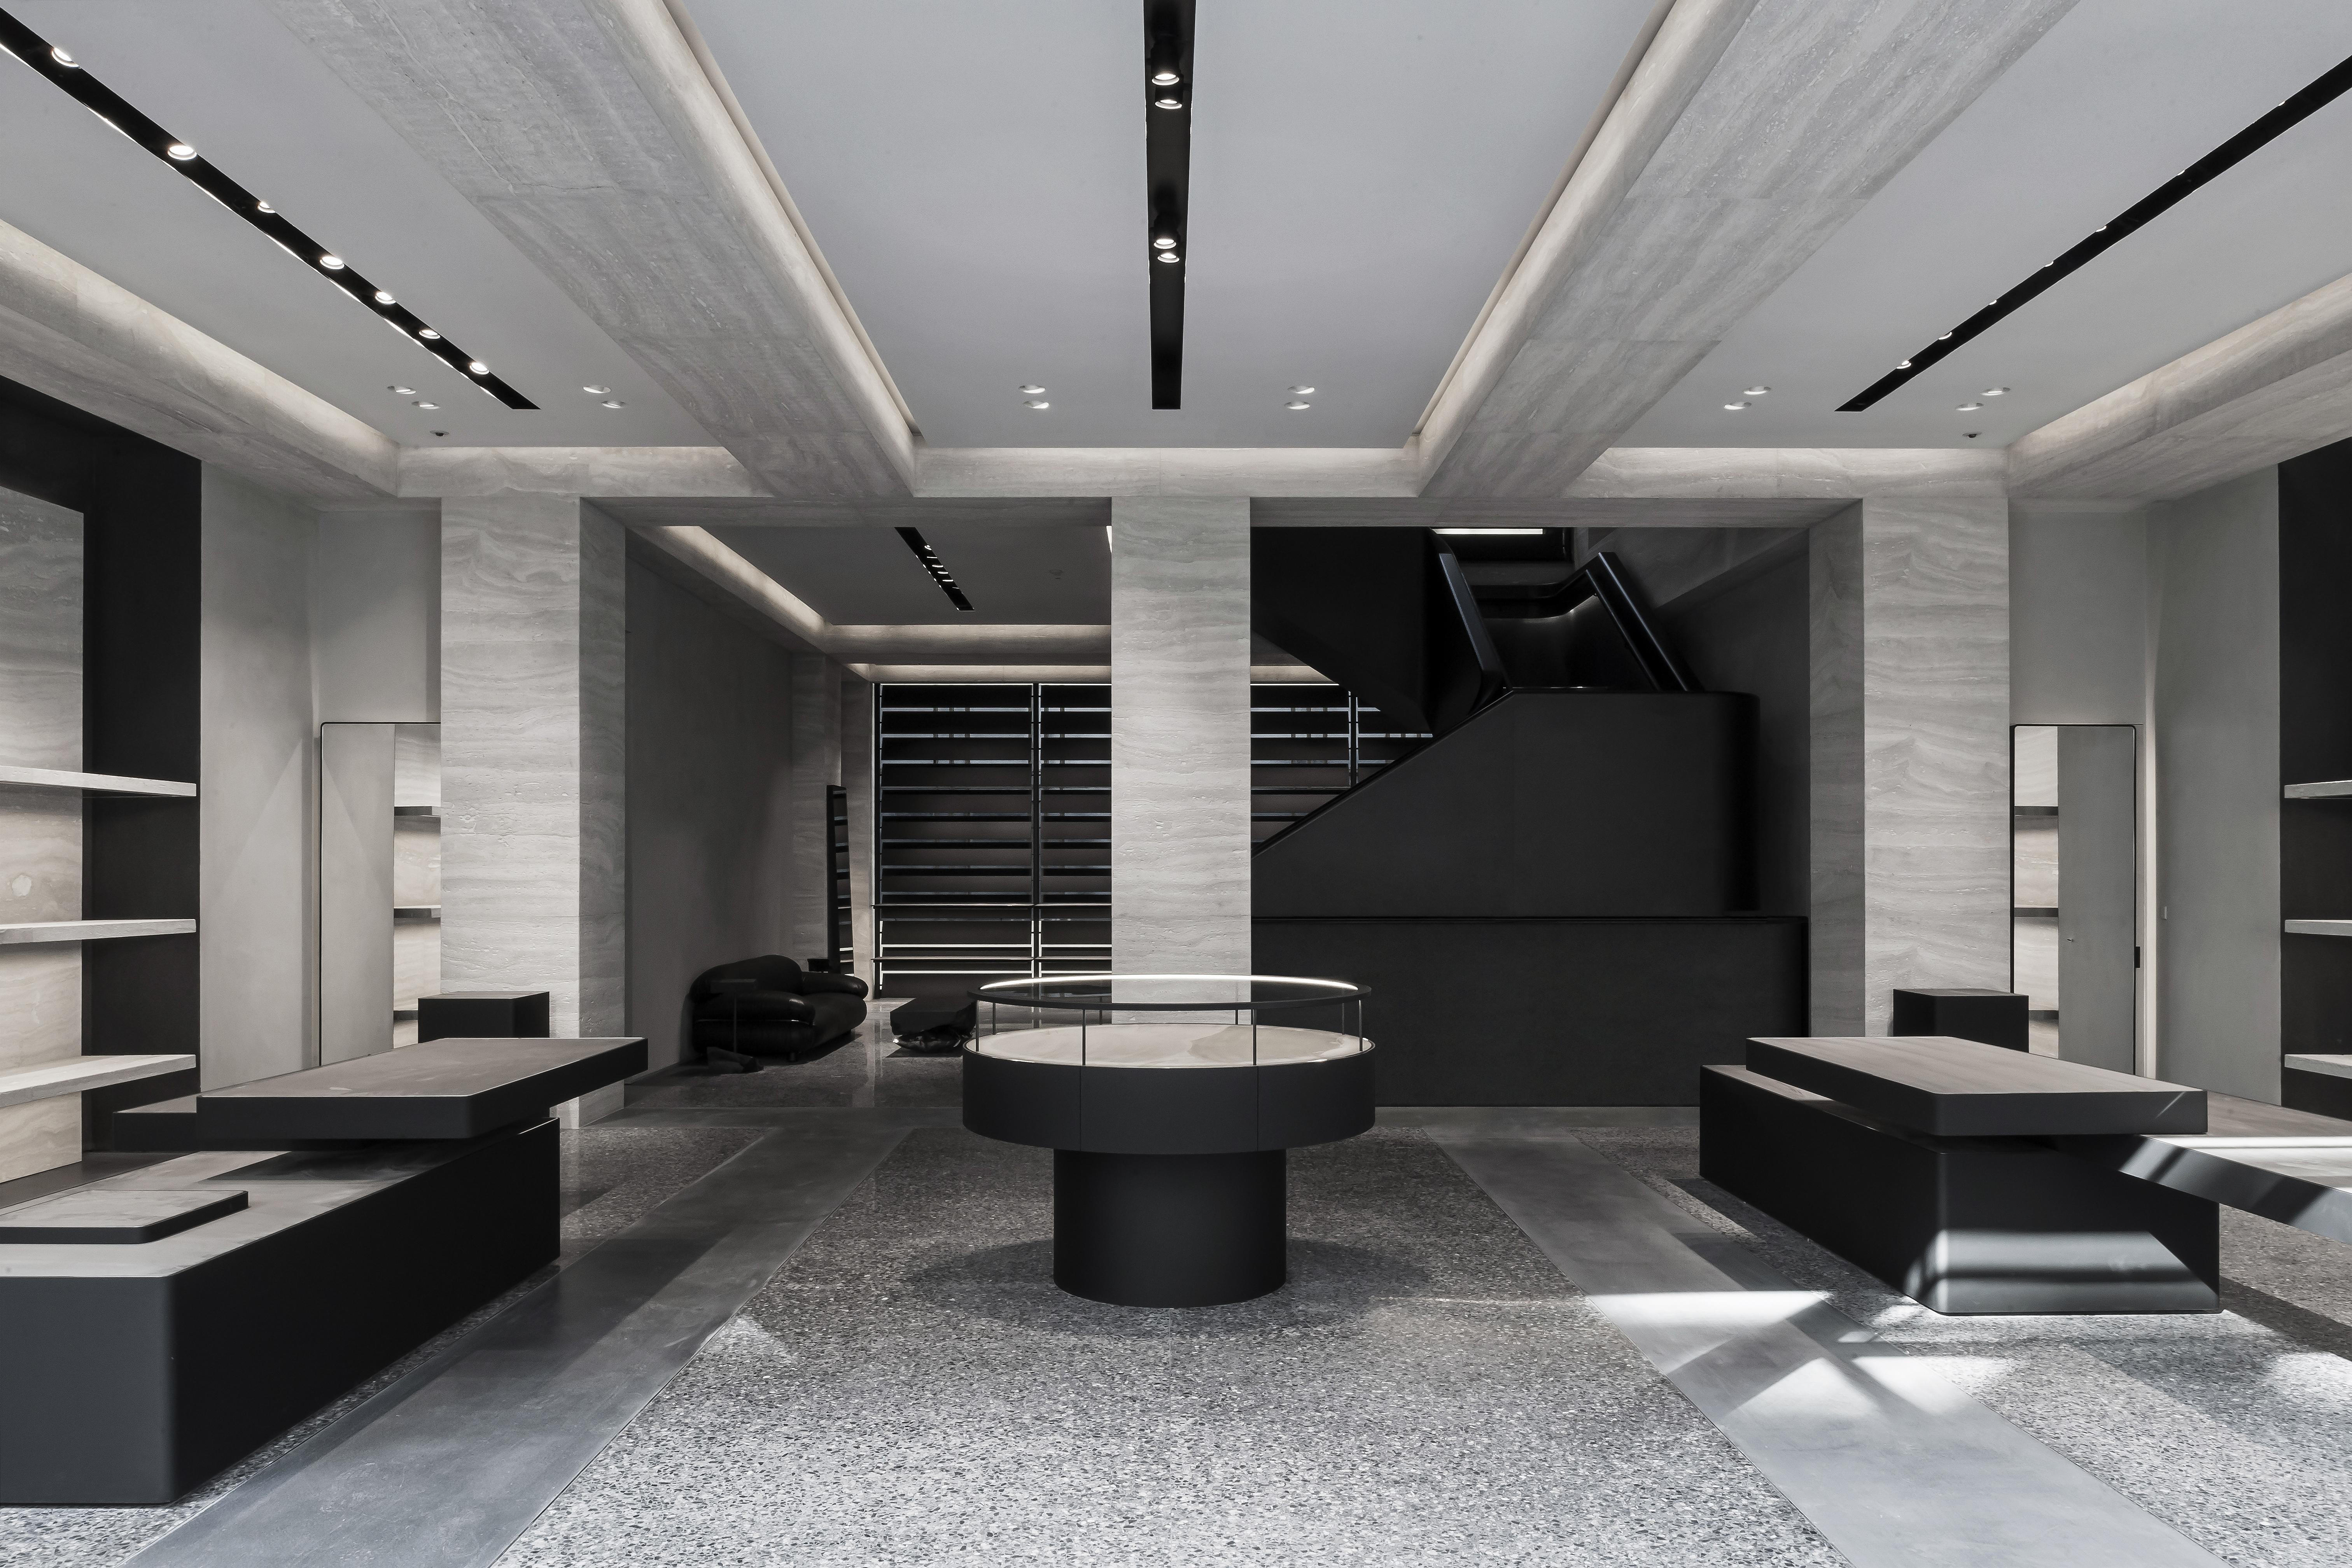 Alexander Wang Flagship Store_Vincent Van Duysen Architects_02.jpg